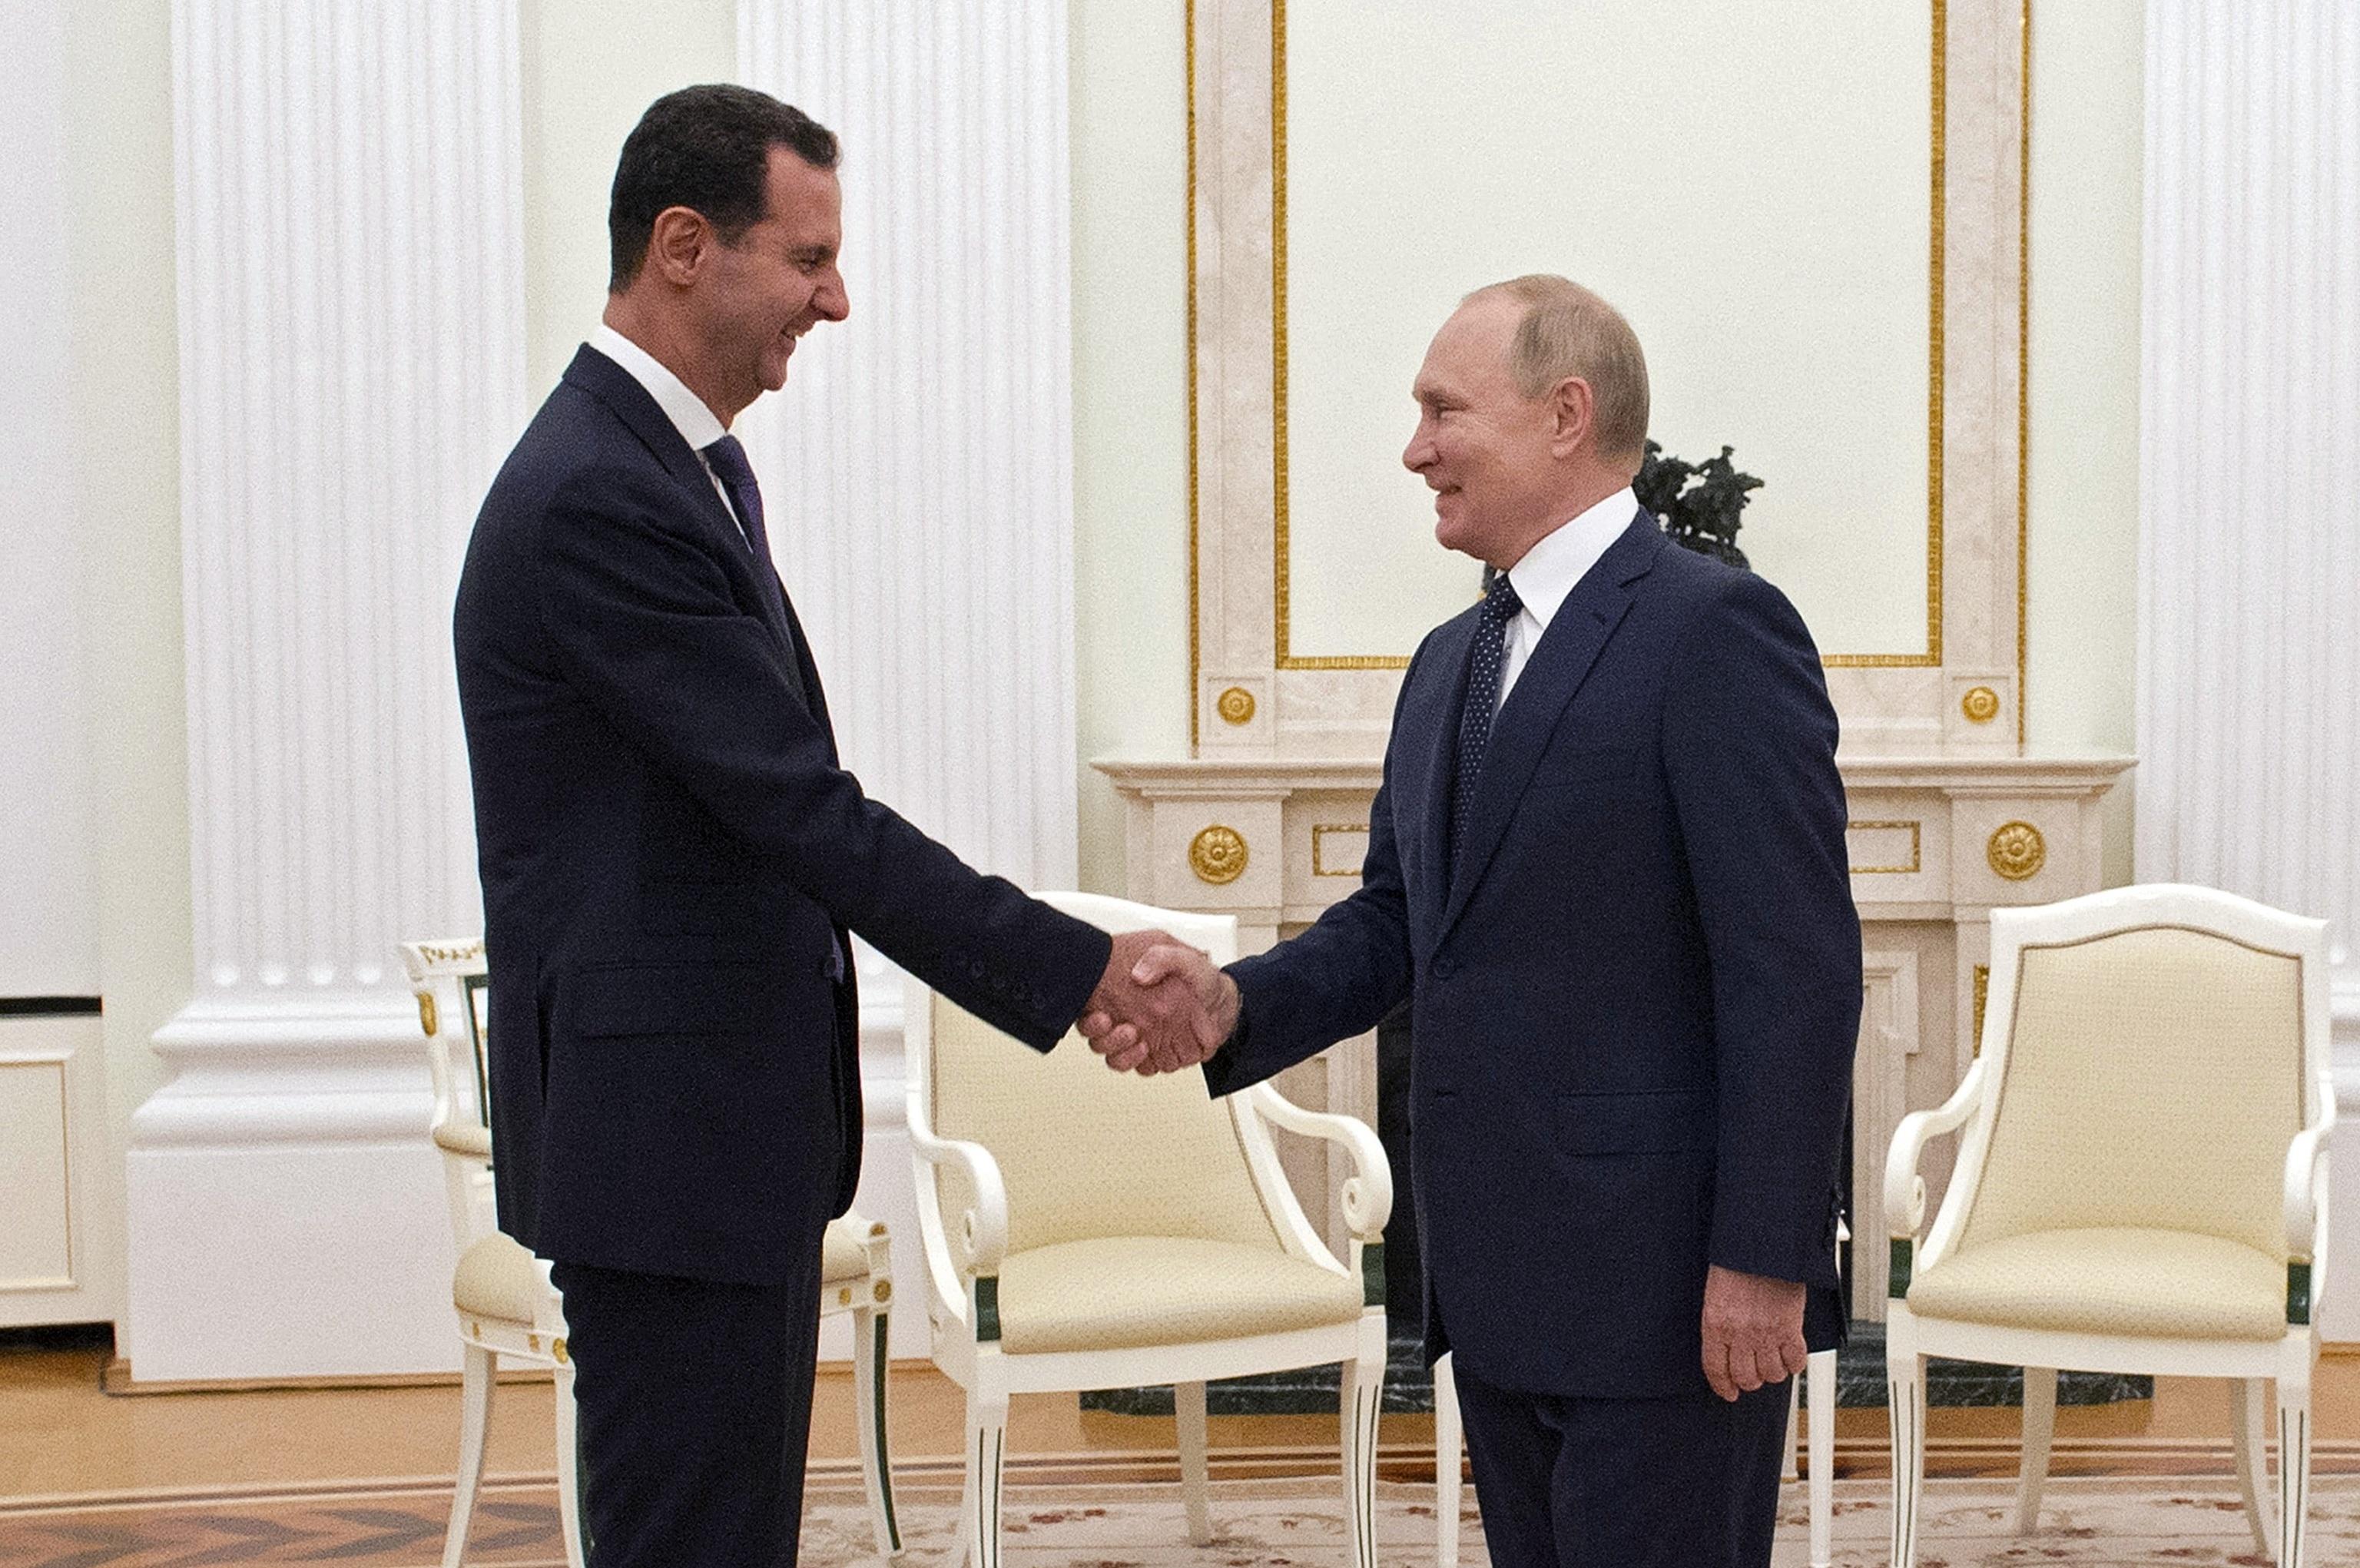 El presidente ruso, Vladimir Putin, estrecha la mano del líder sirio Bashar Asad.